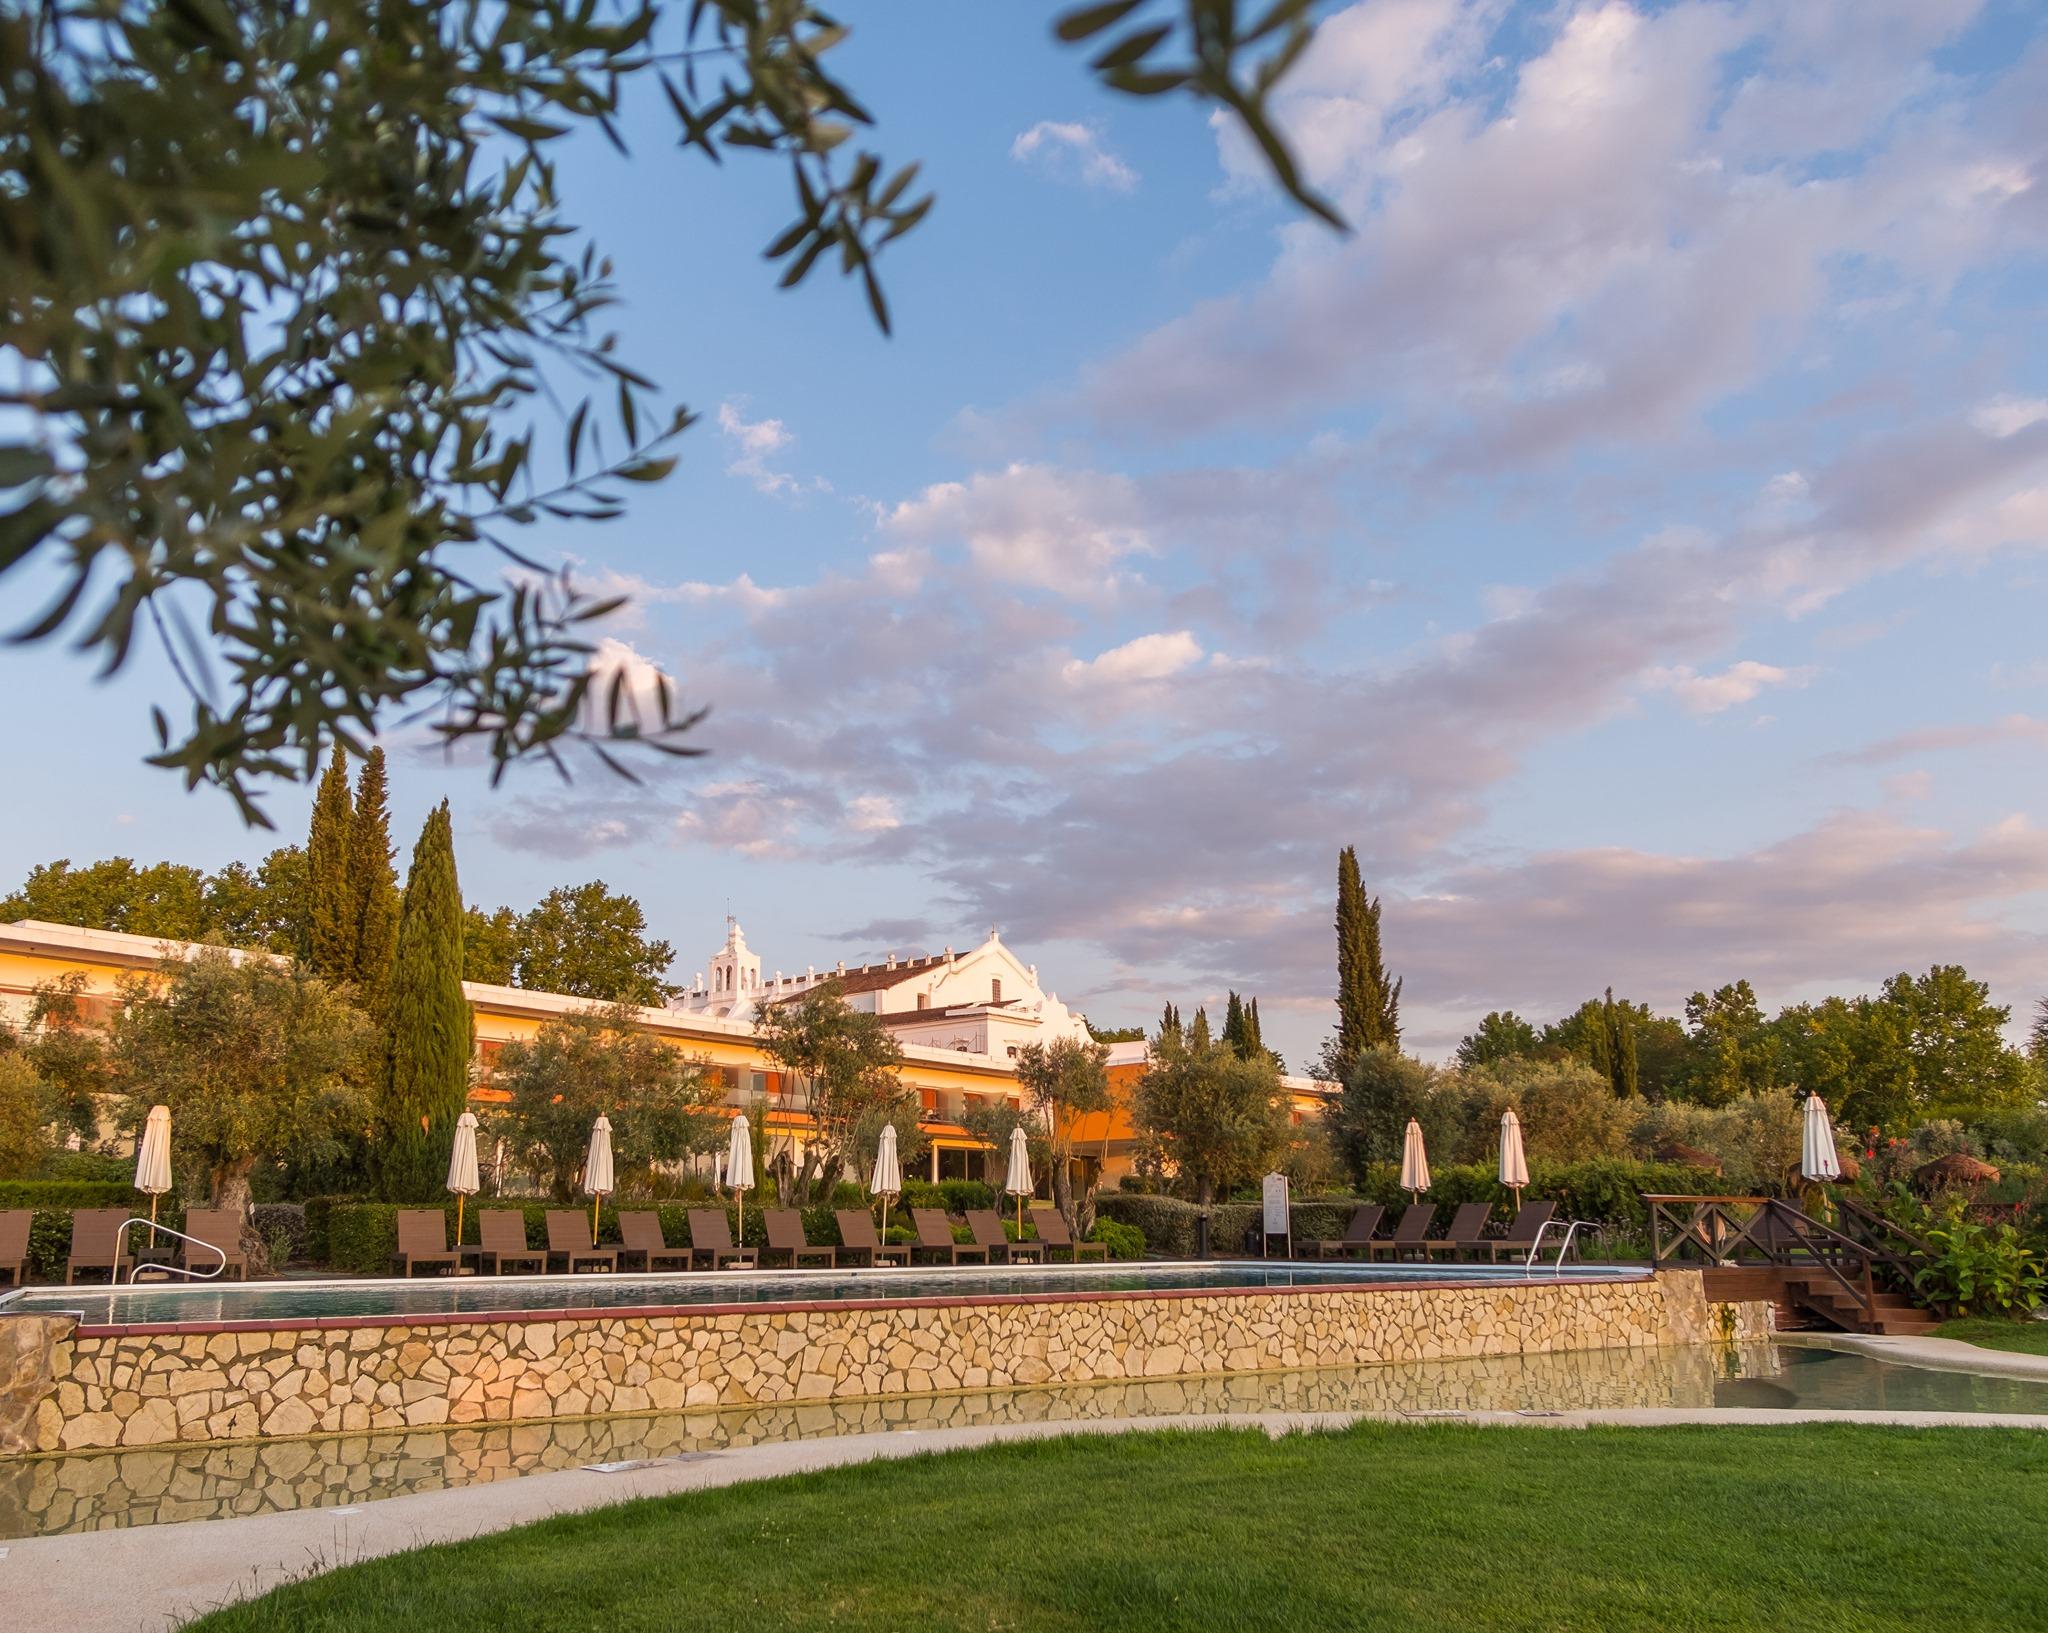 Convento do Espinheiro – Alentejo Heritage